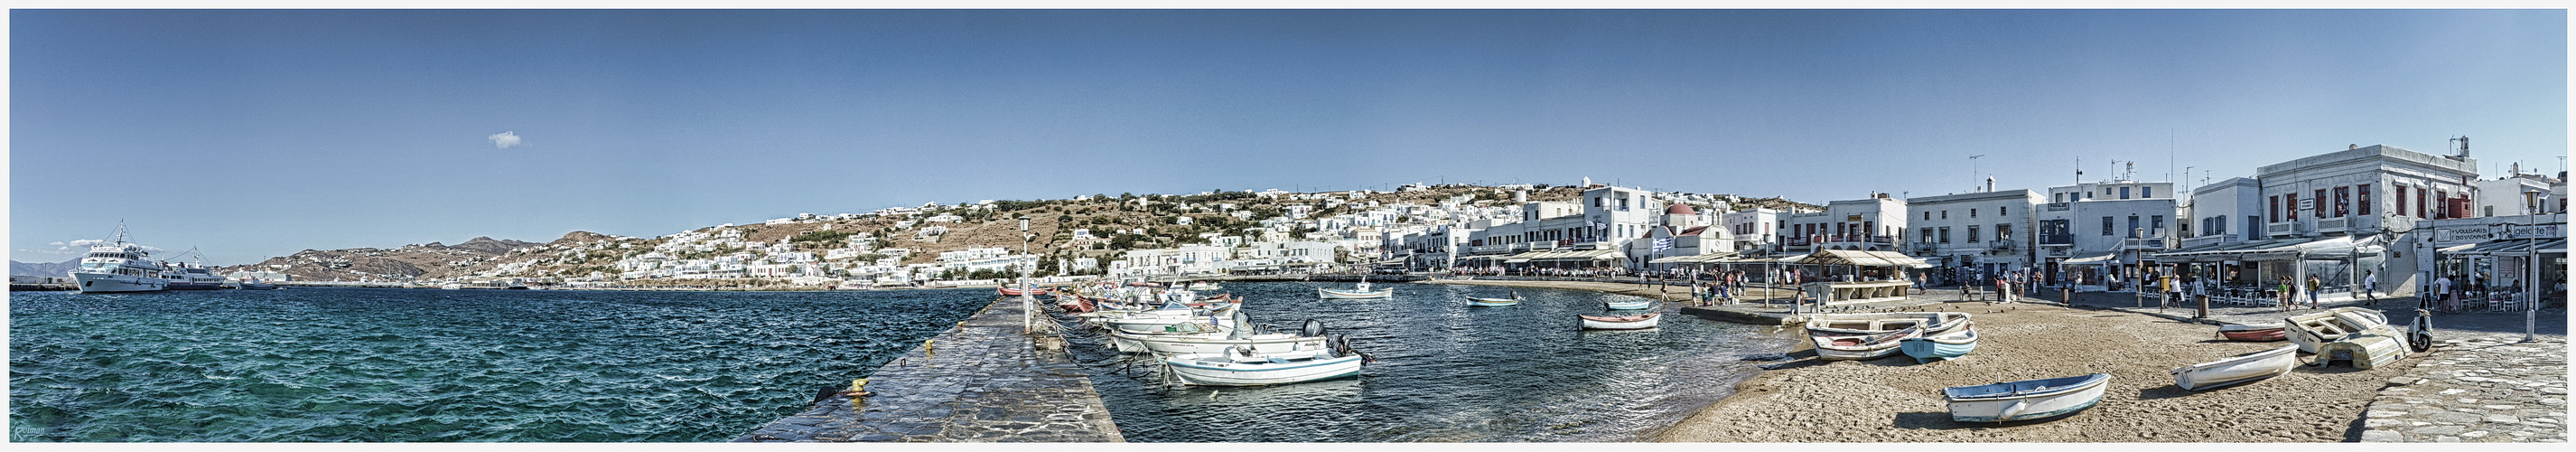 Insel Mykonos 4